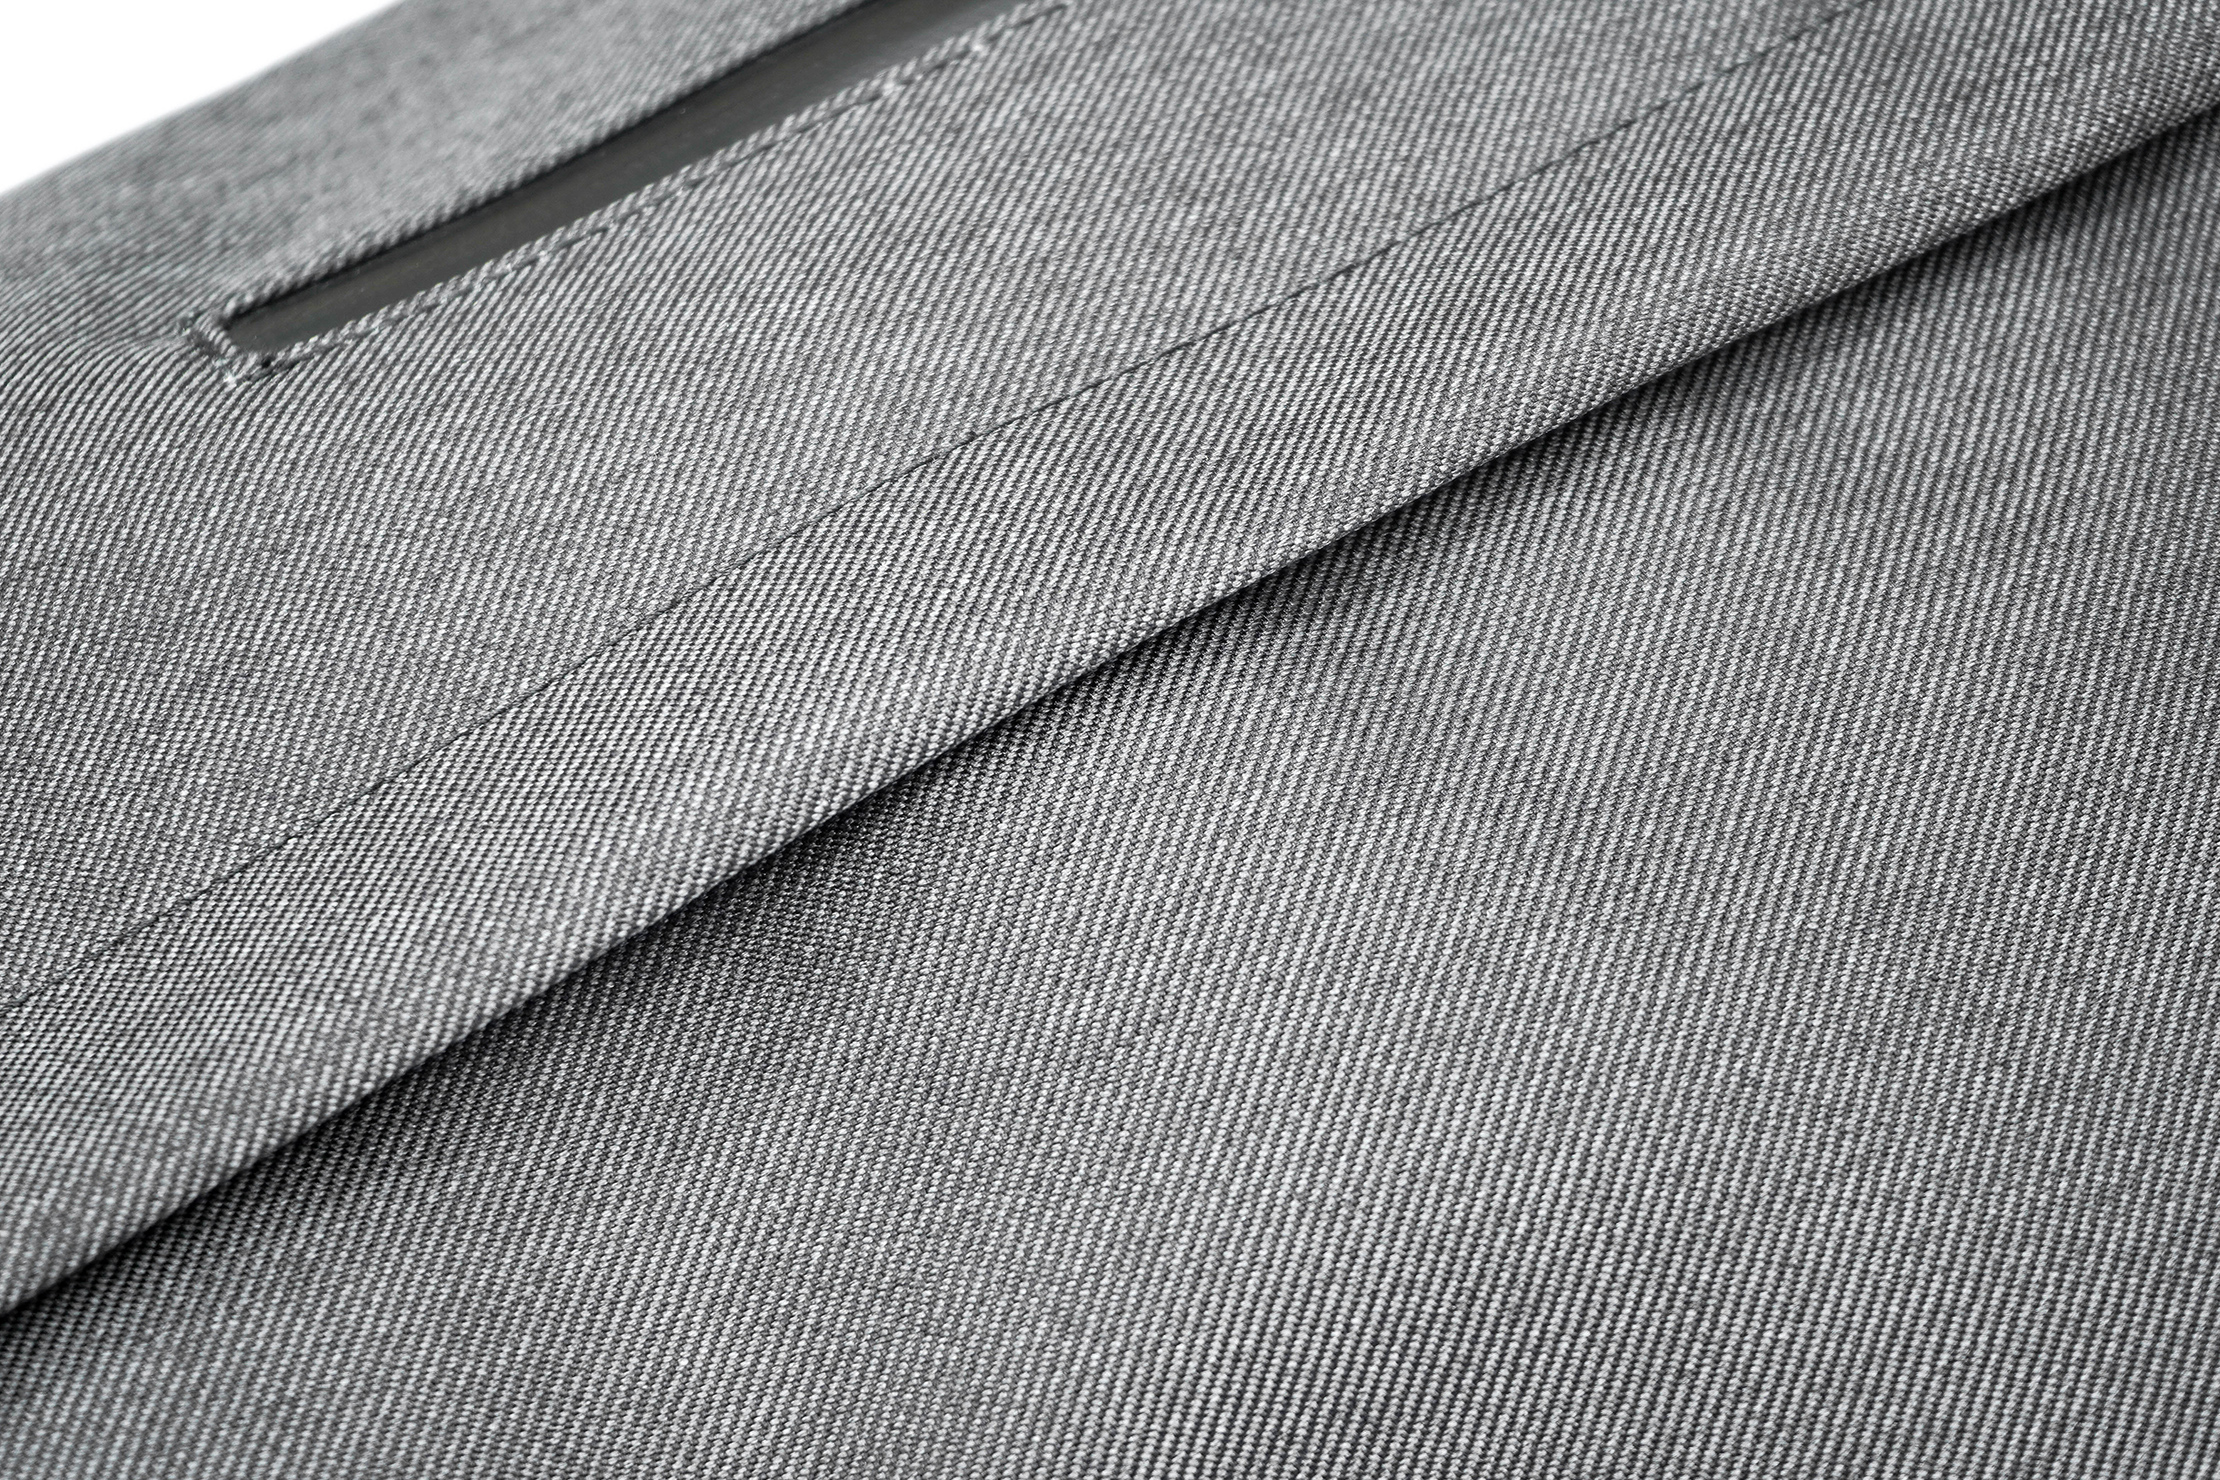 Chrome Summoner Backpack Material